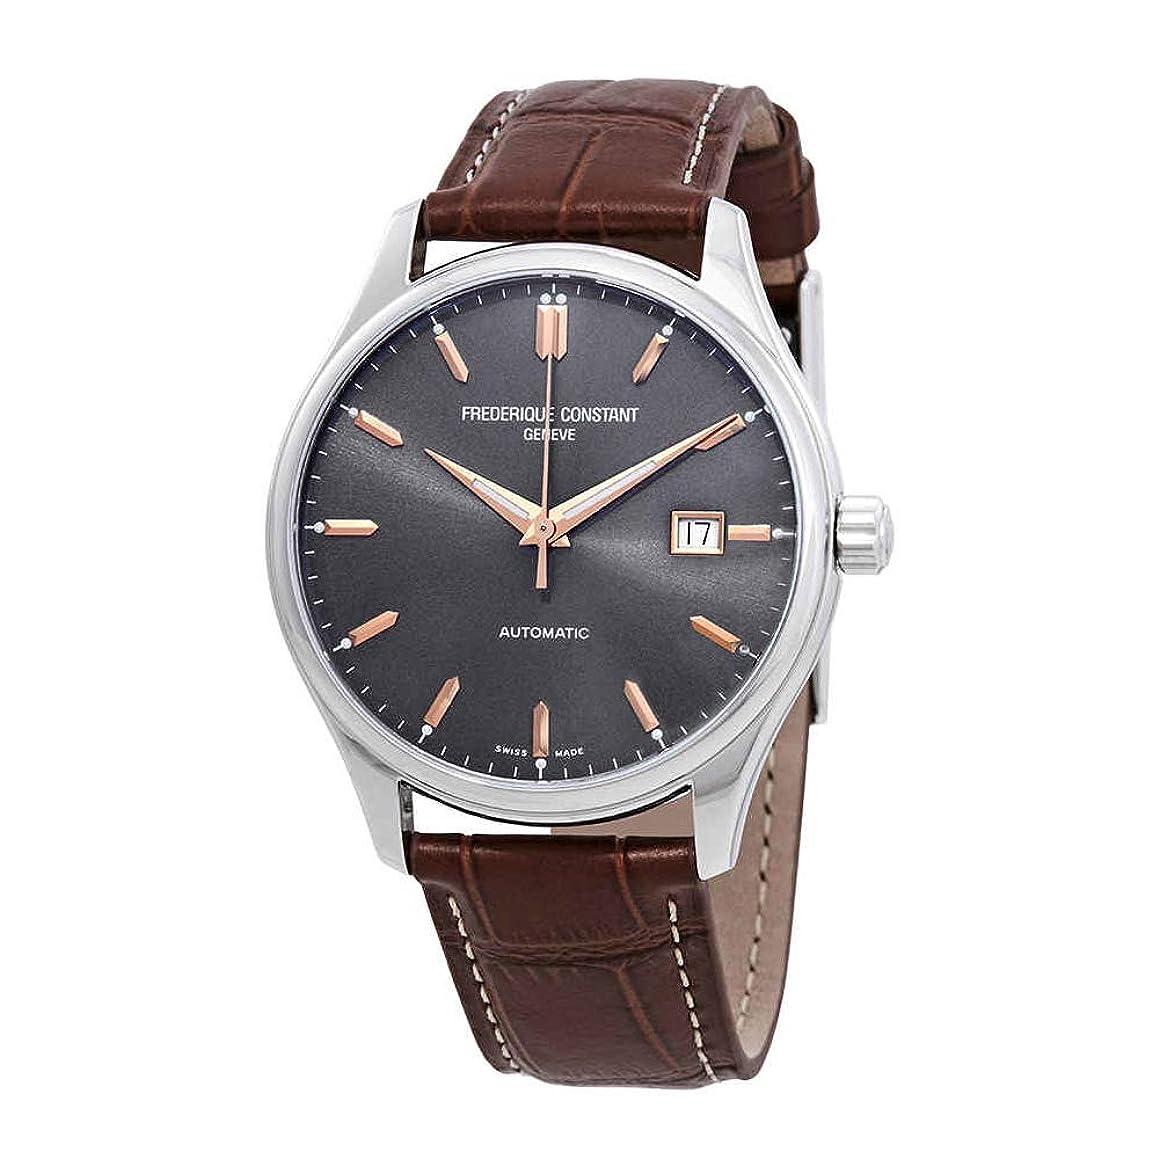 Frederique Constant Classics Grey Dial Leather Strap Men's Watch FC-303LGR5B6